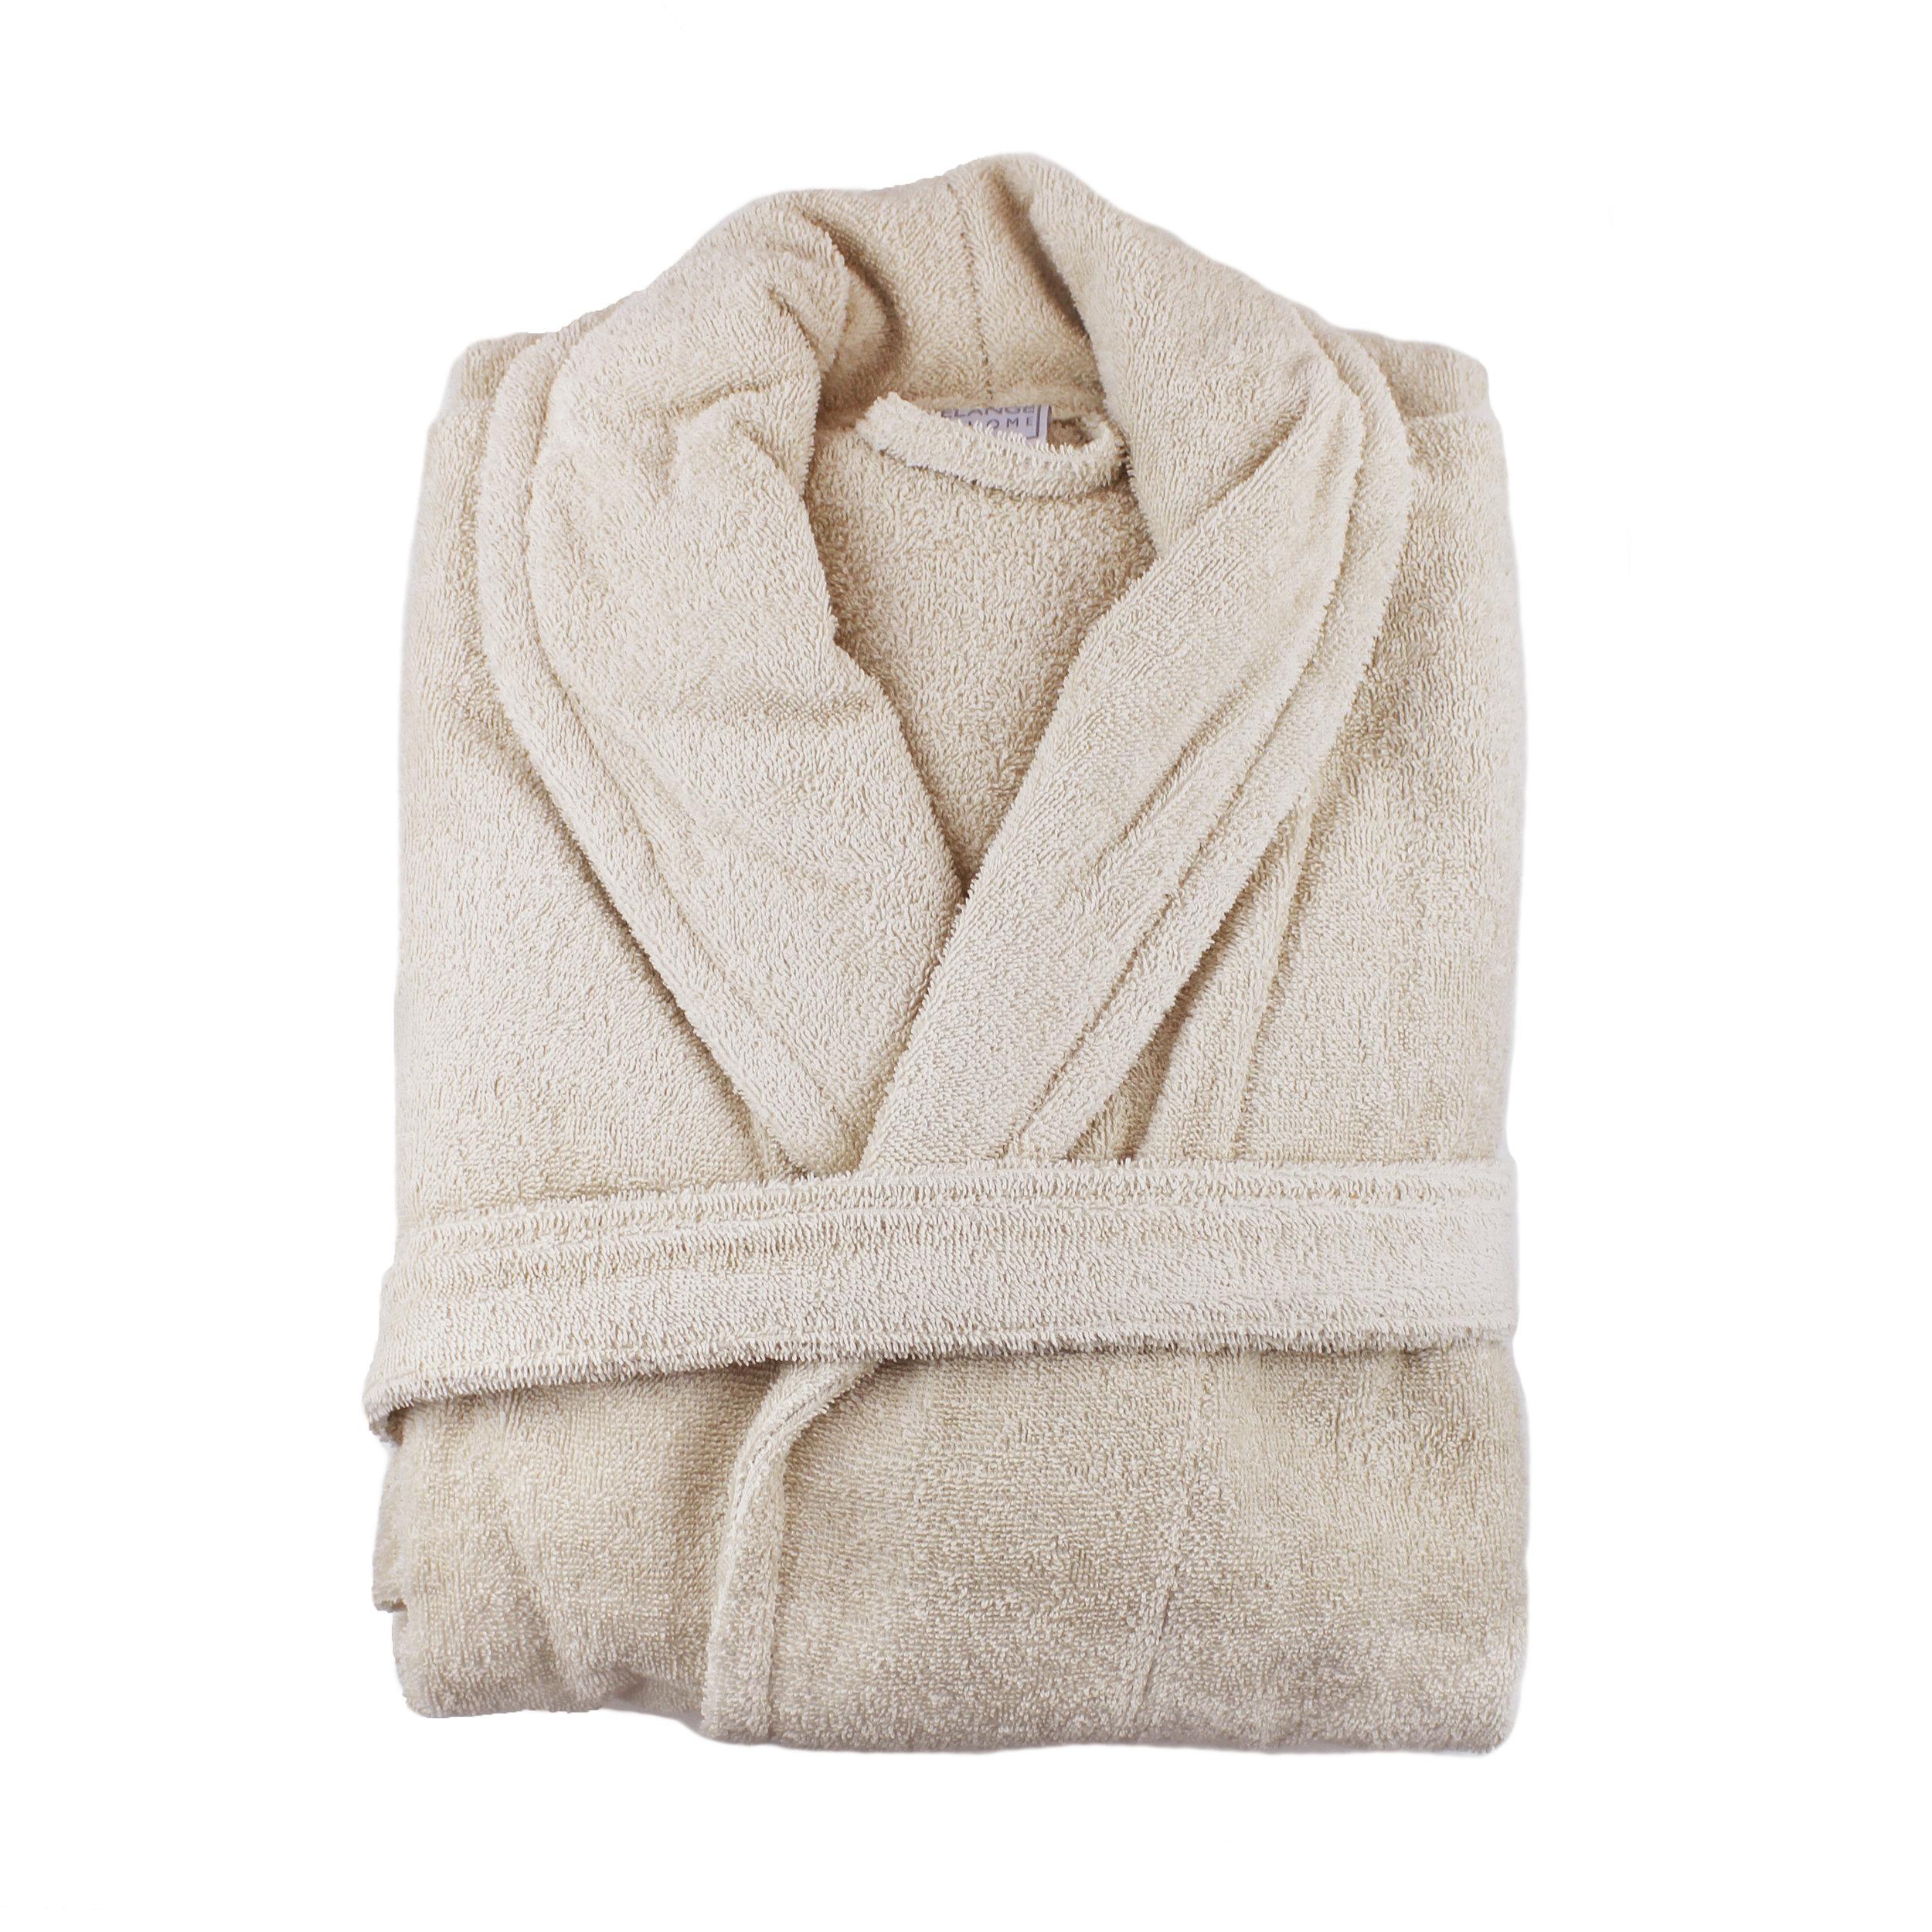 193134 Turkish Bath Robe_Taupe.jpg